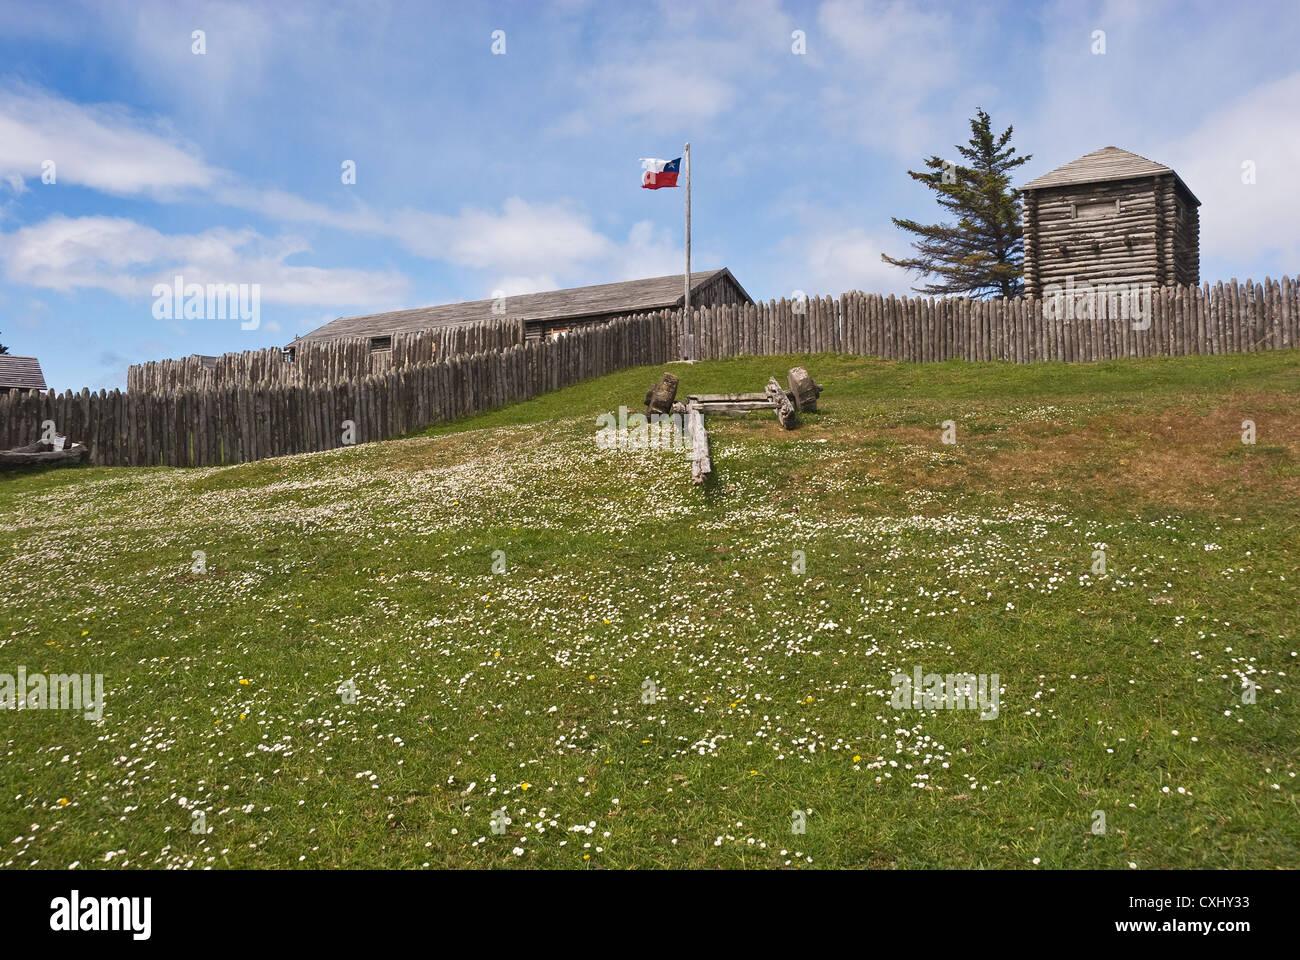 Elk198-4144 Chile, Patagonia, Straights of Magellan, Fort Bulnes 1843 - Stock Image